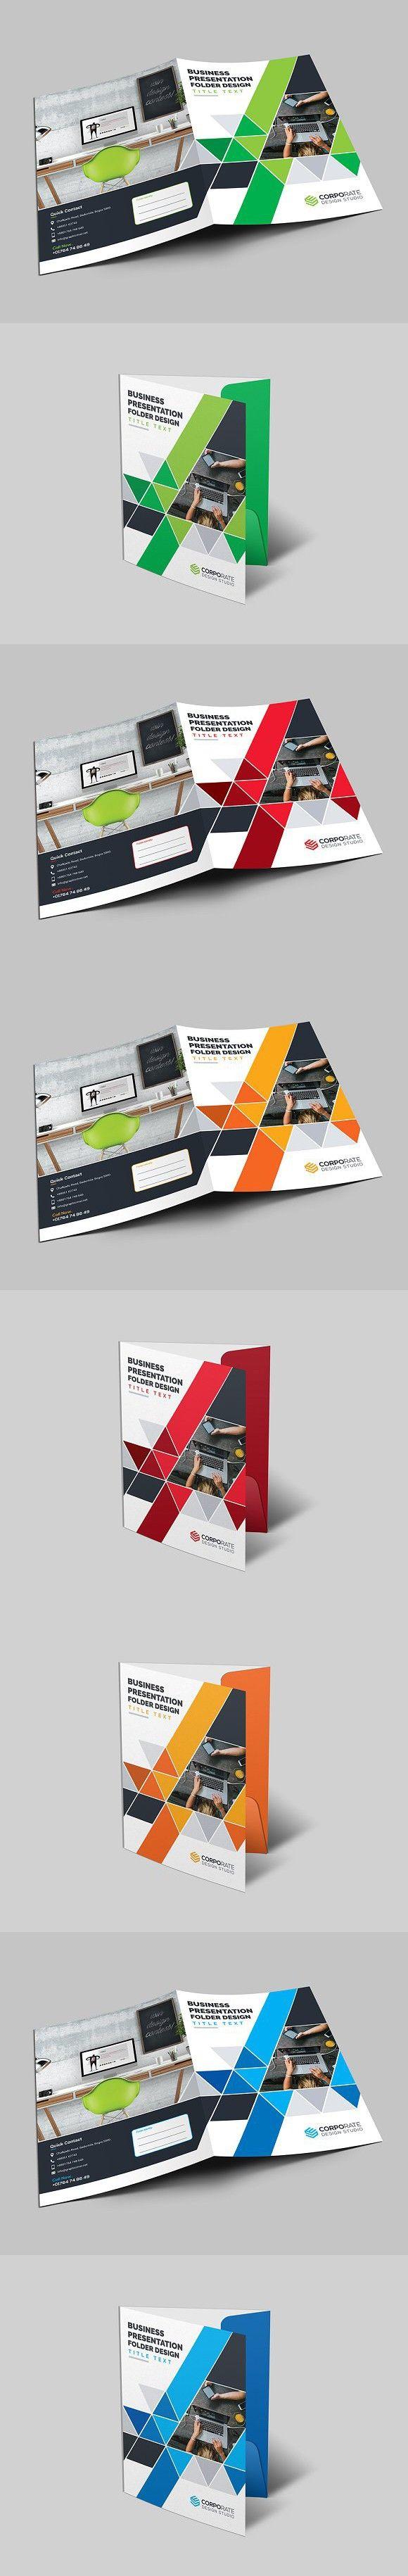 Corporate Folder. Stationery Templates